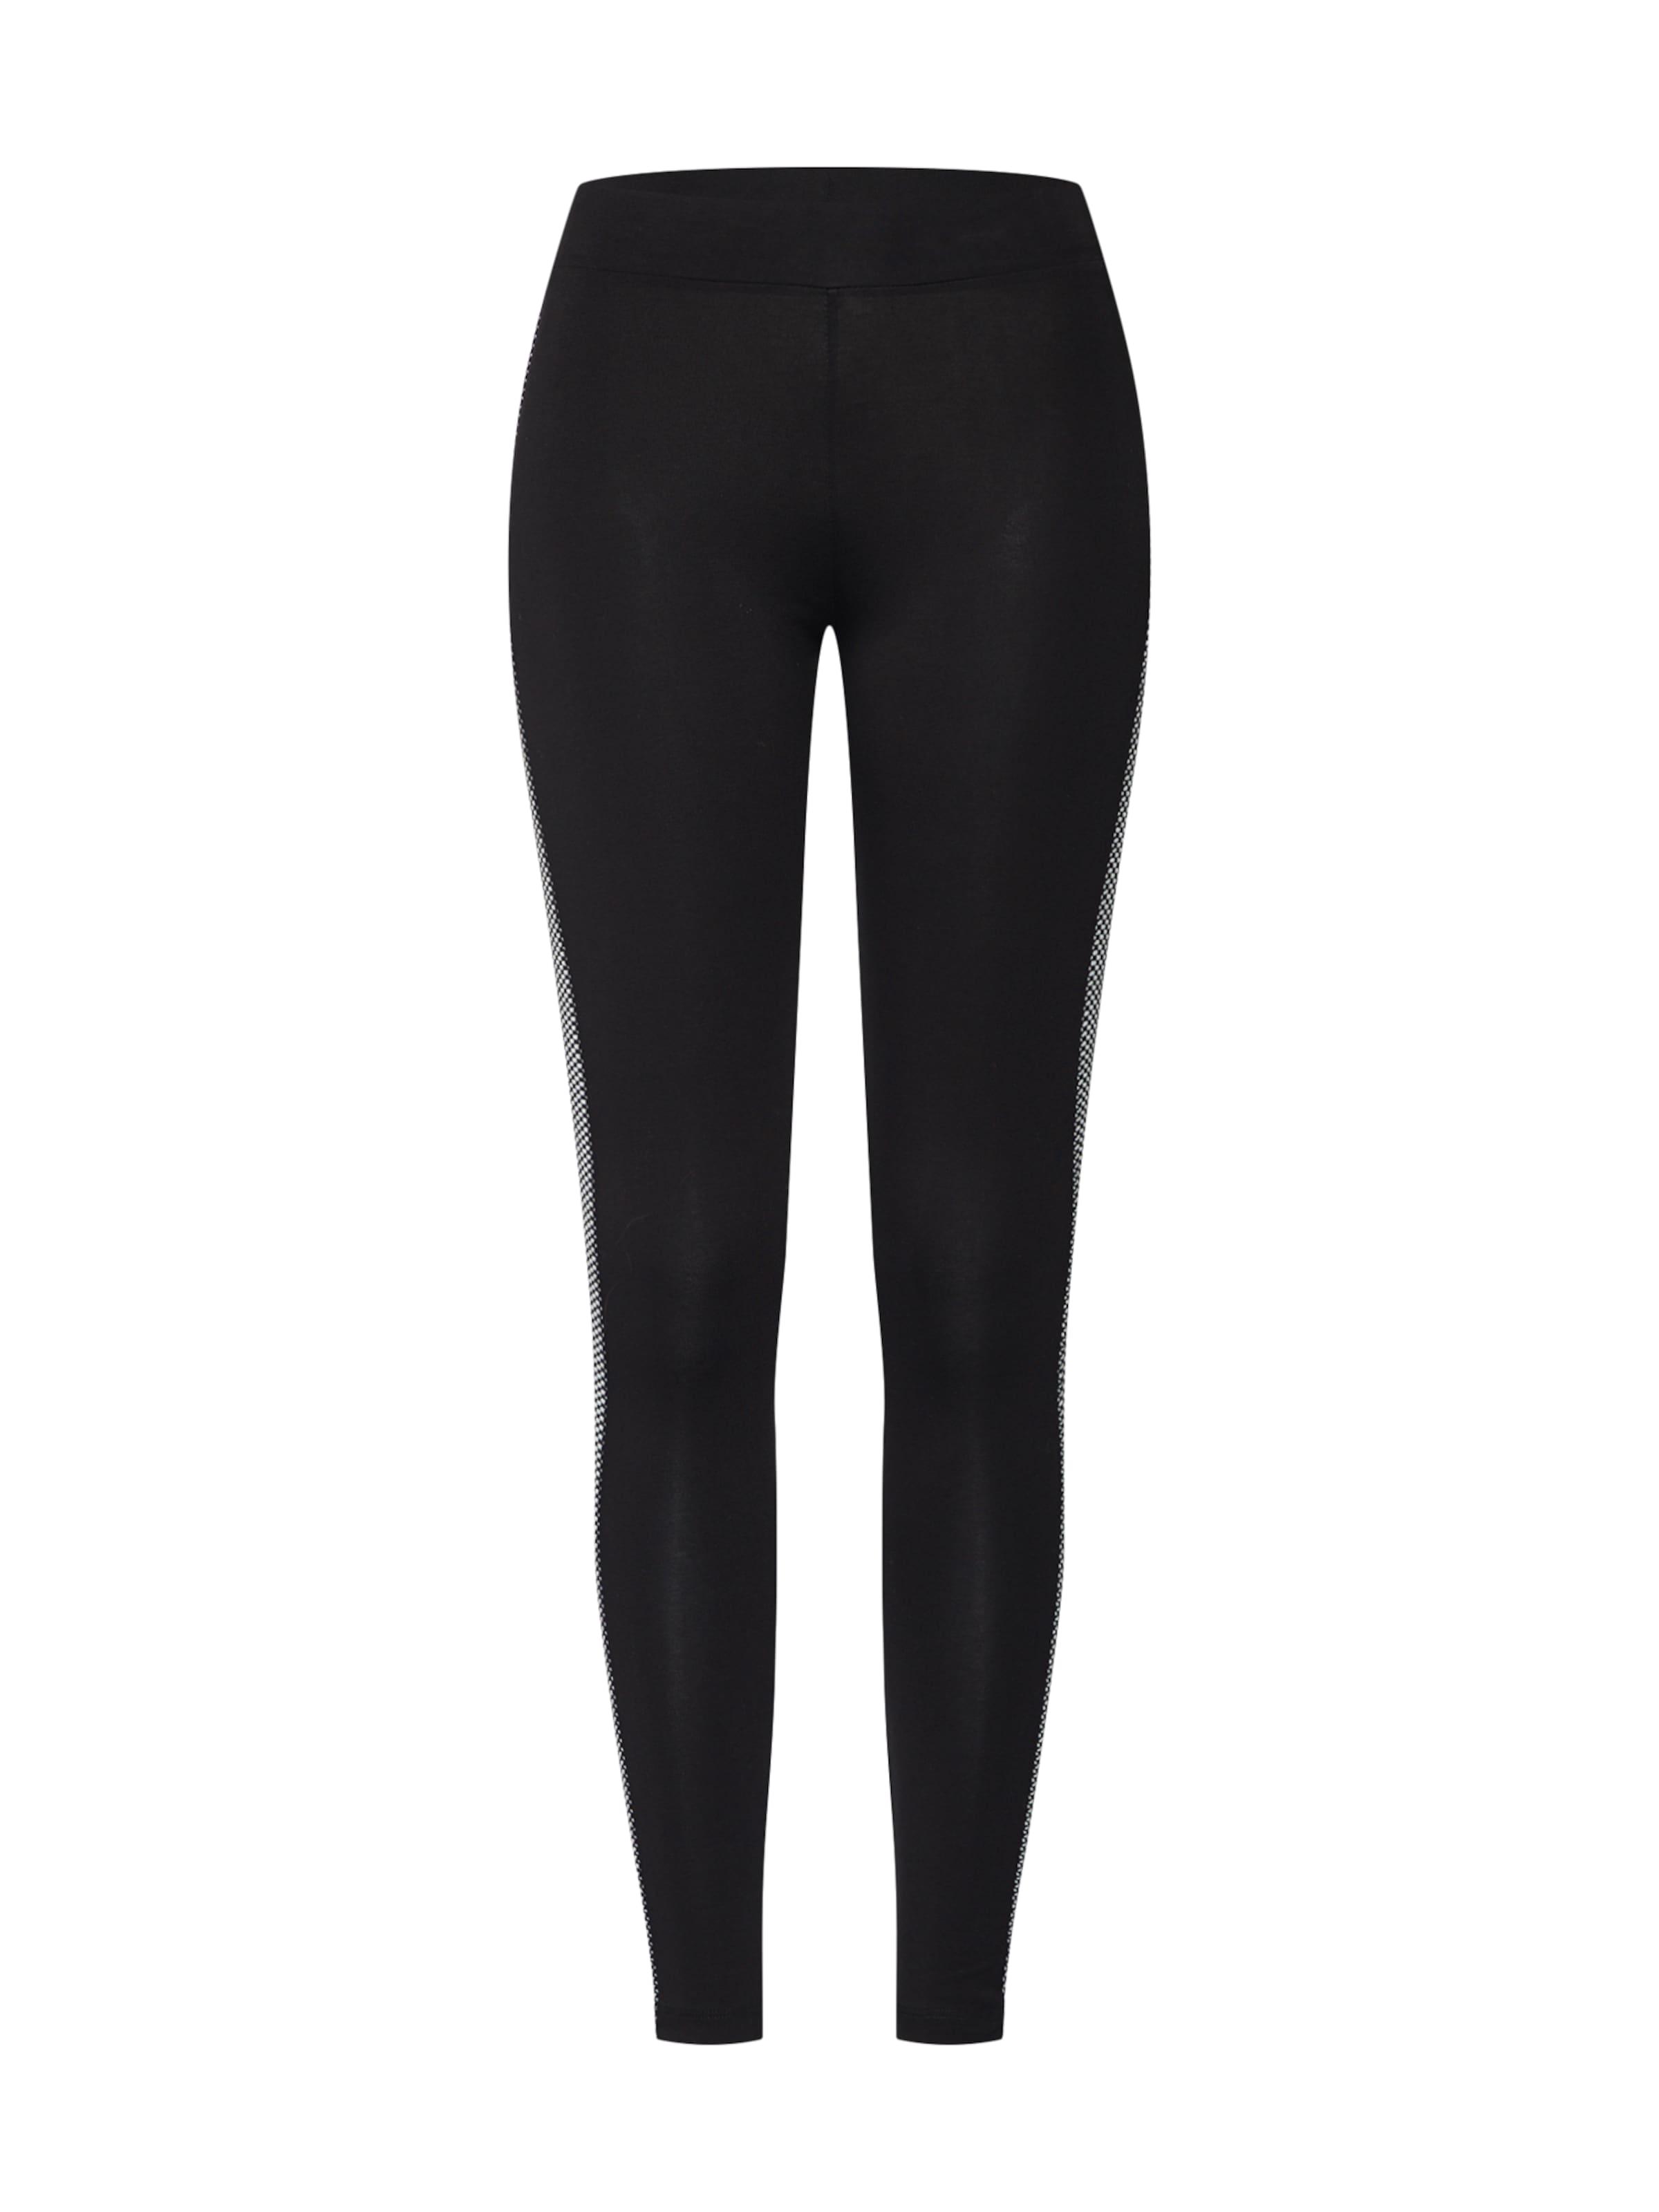 NEW LOOK Leggings i svart / vit